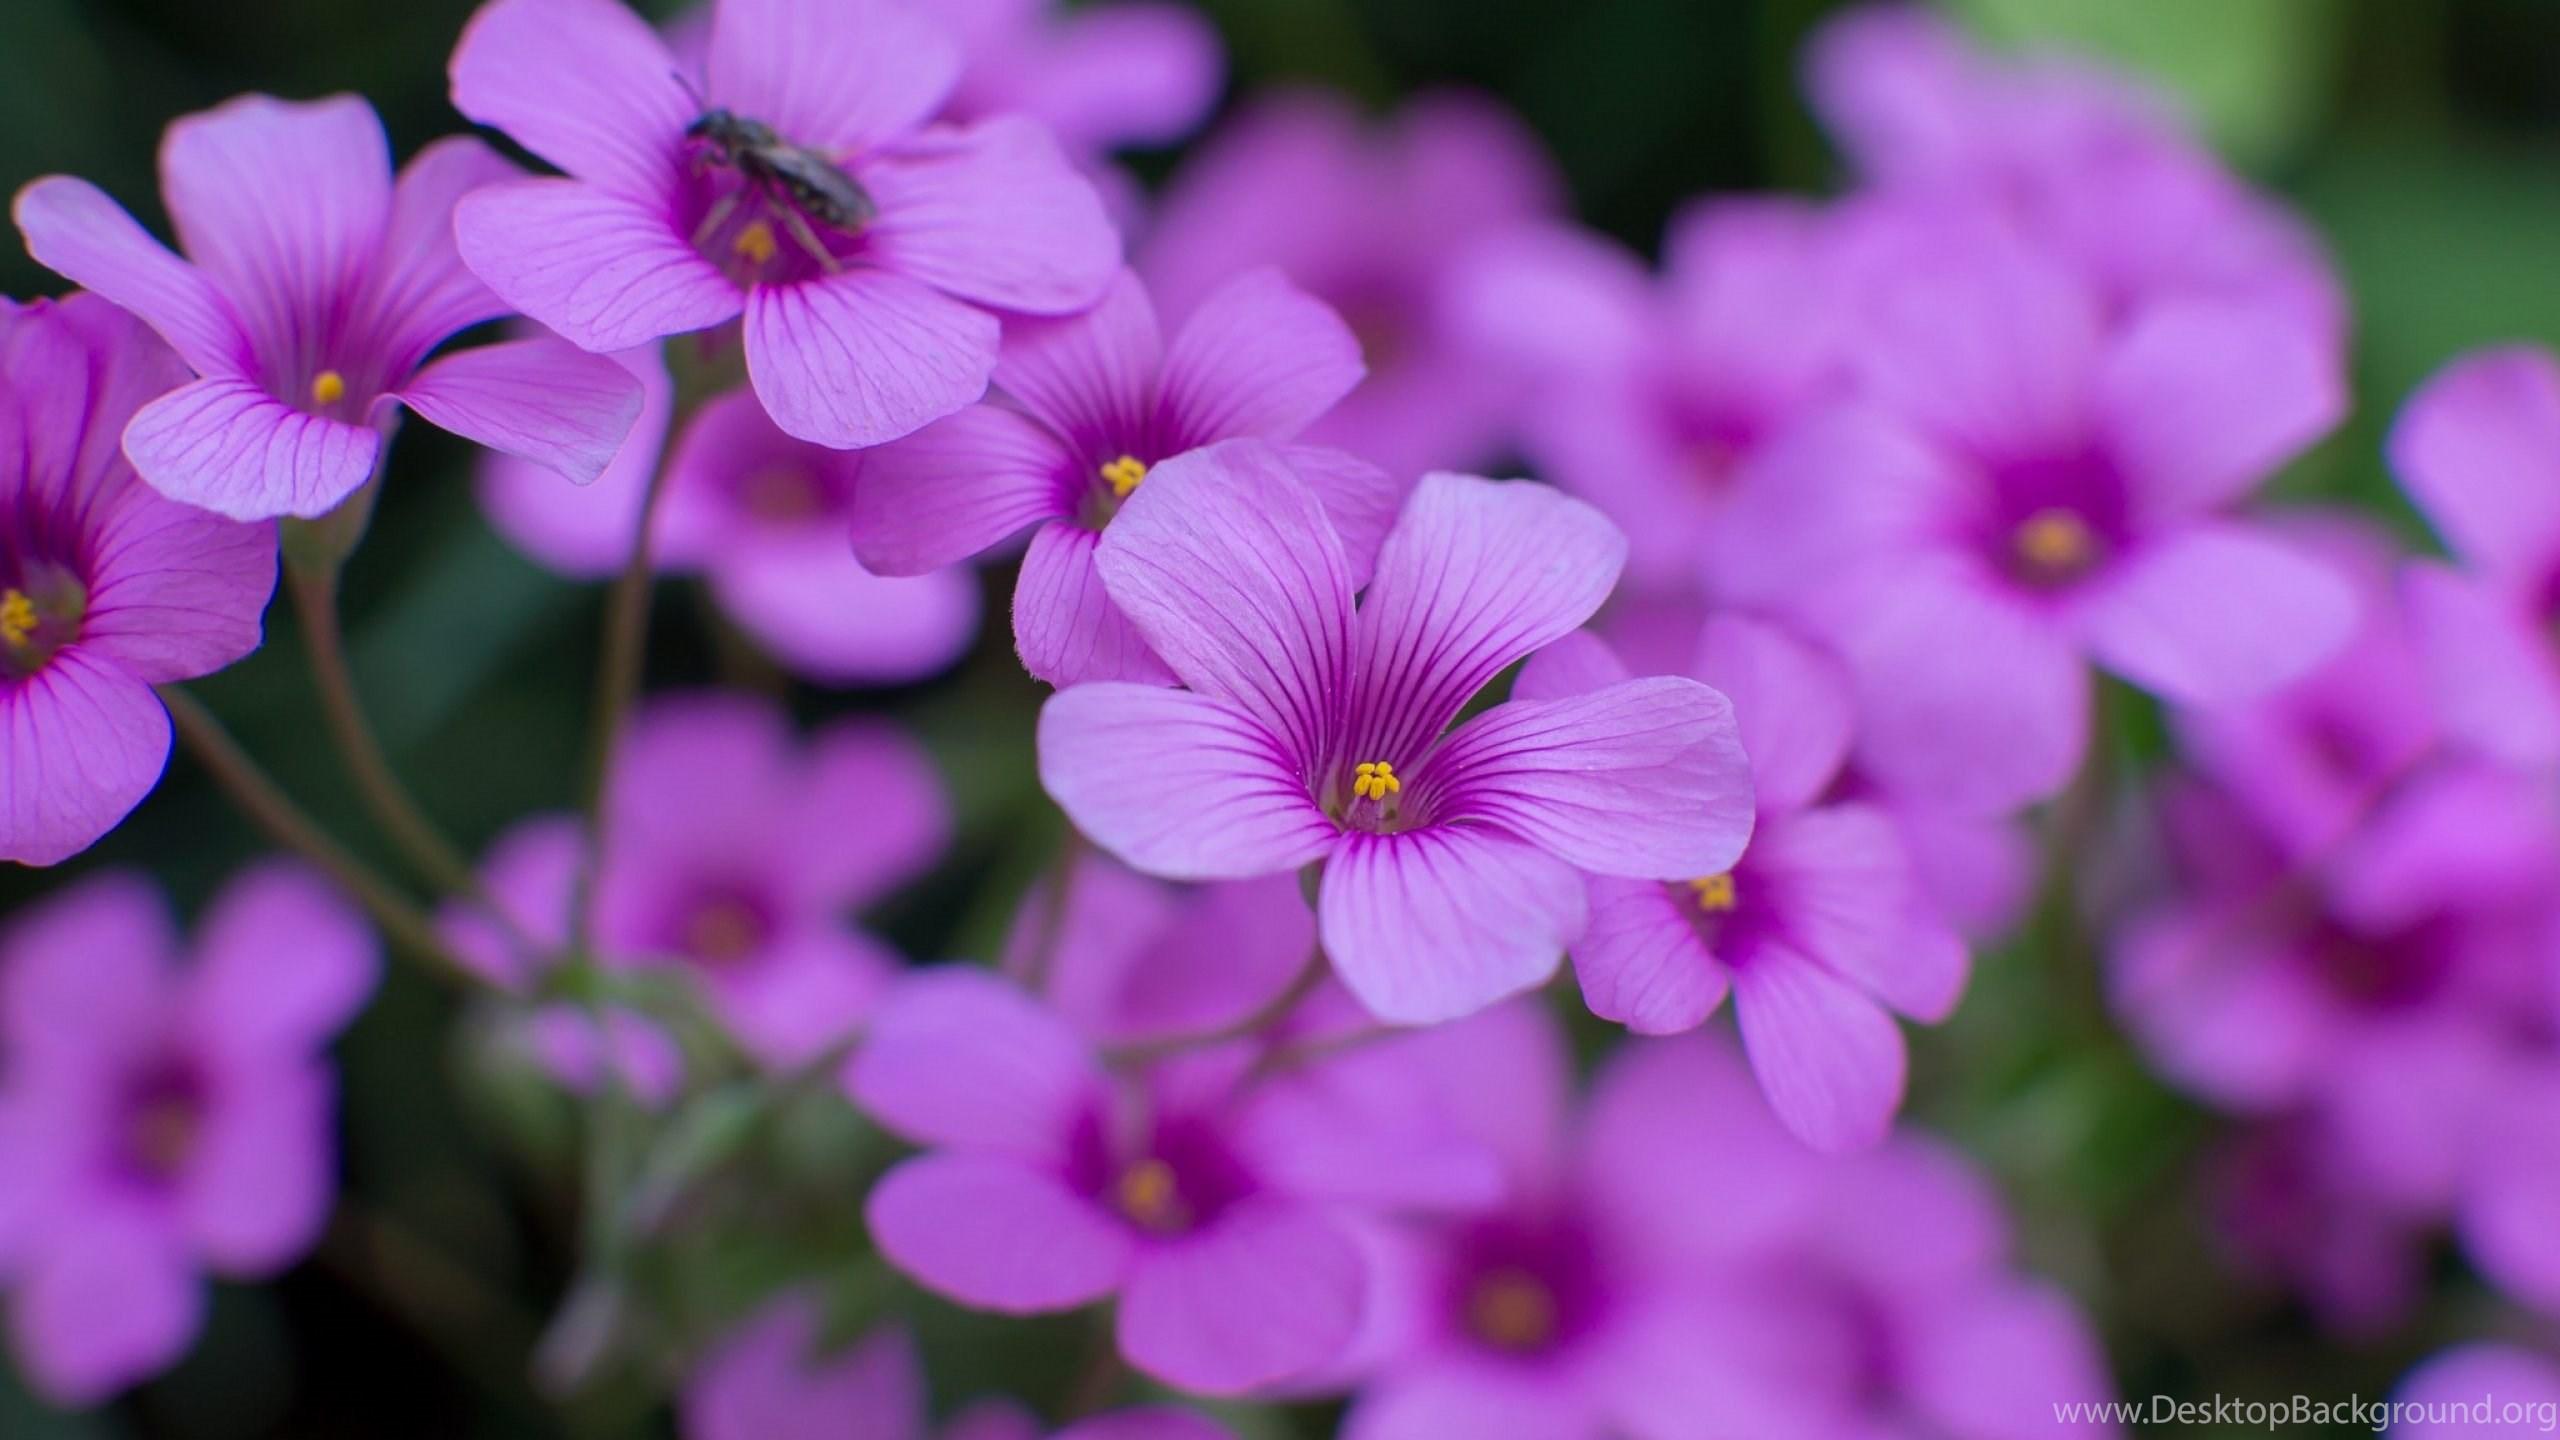 Oxalis Beautiful Flowers Wallpapers Hd Download For Desktop Desktop